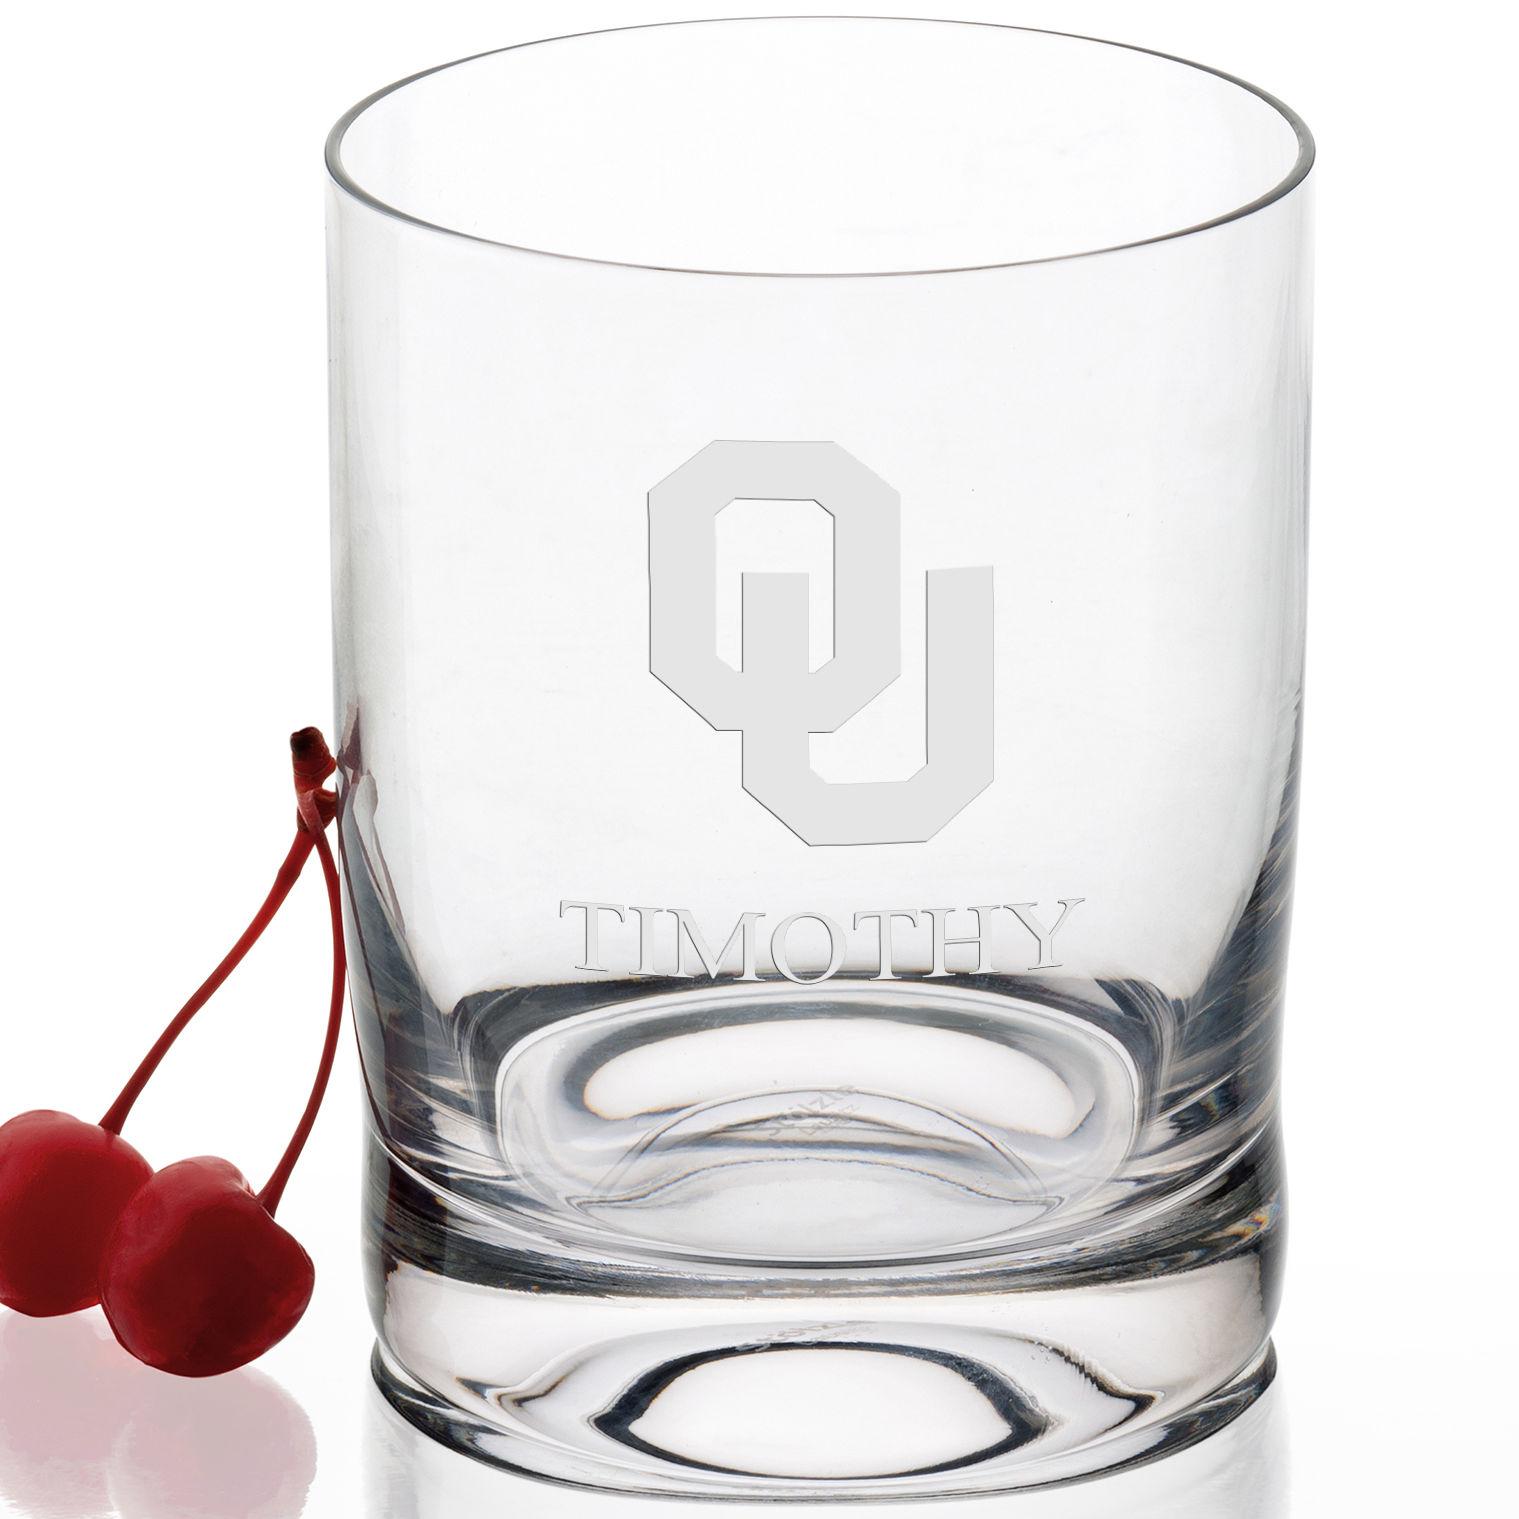 Oklahoma Tumbler Glasses - Set of 4 - Image 2